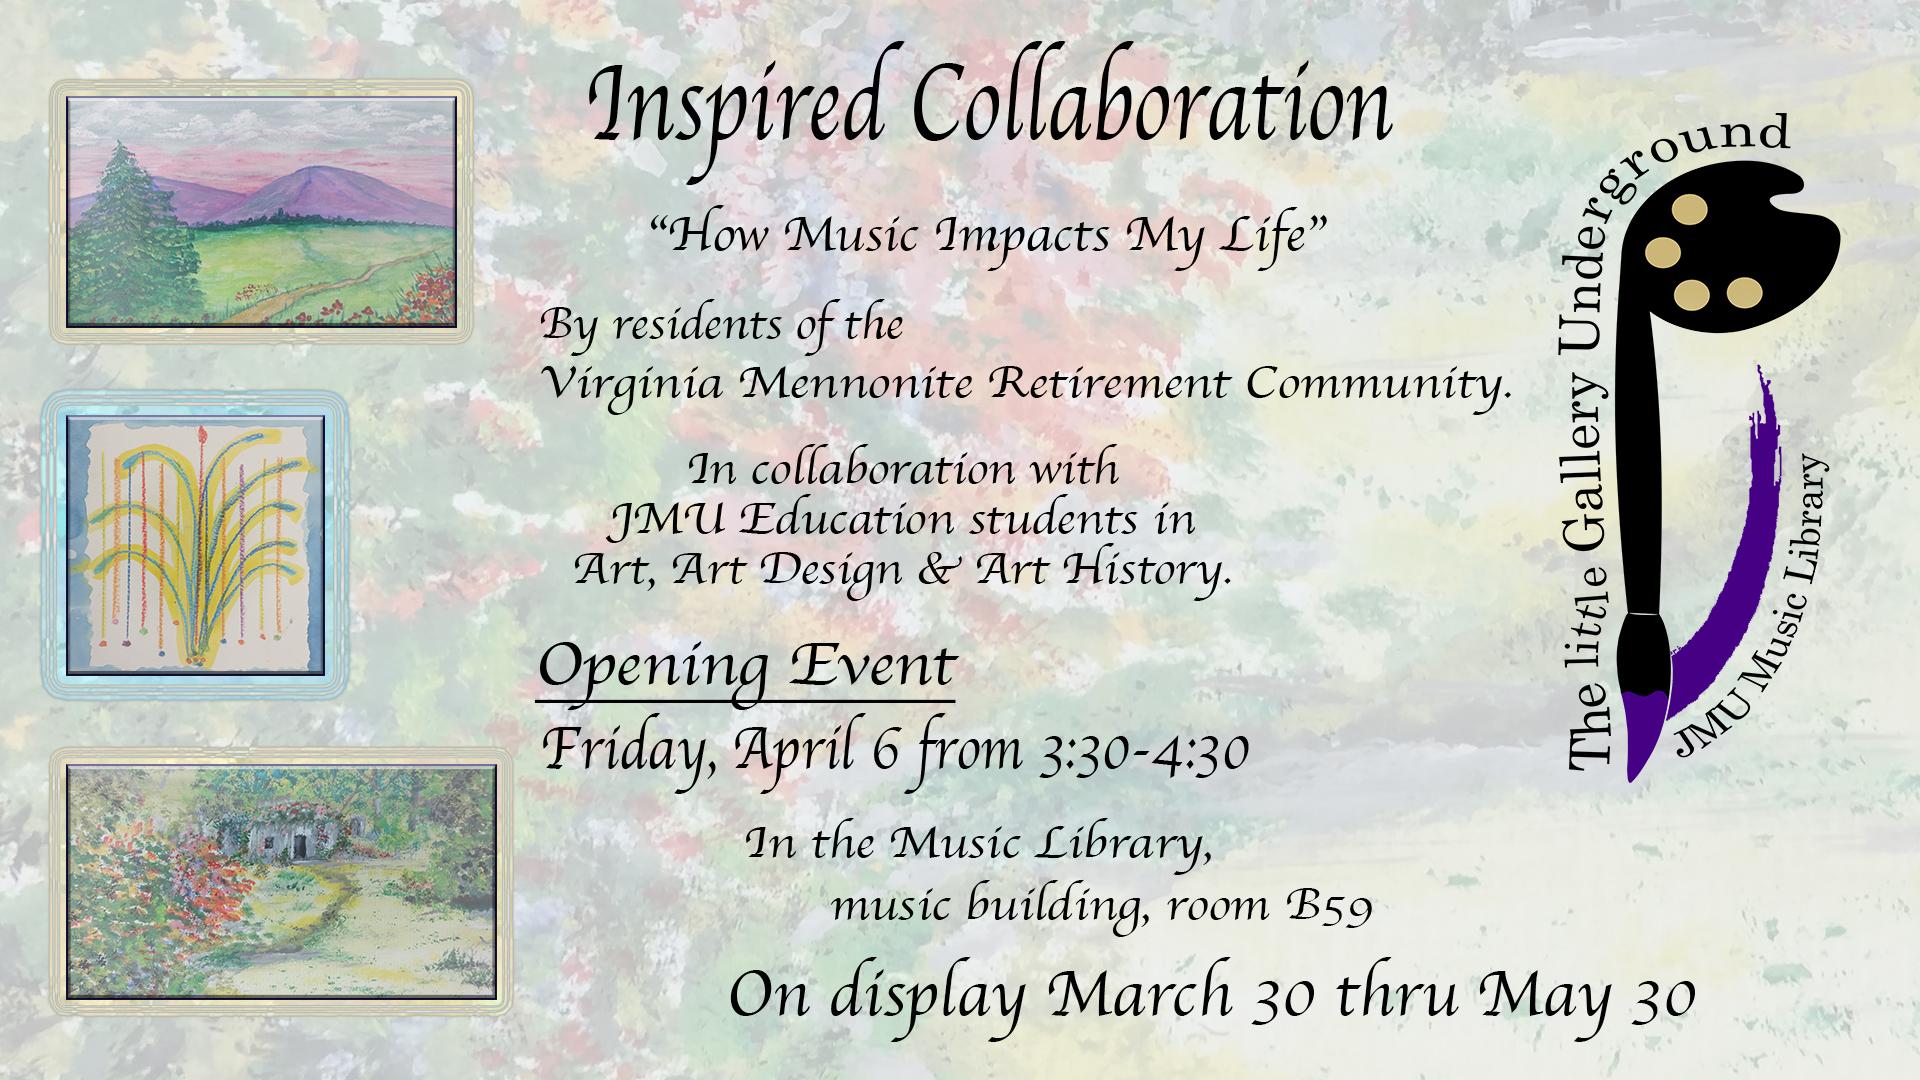 Inspiring Collaboration Exhibit Announcement